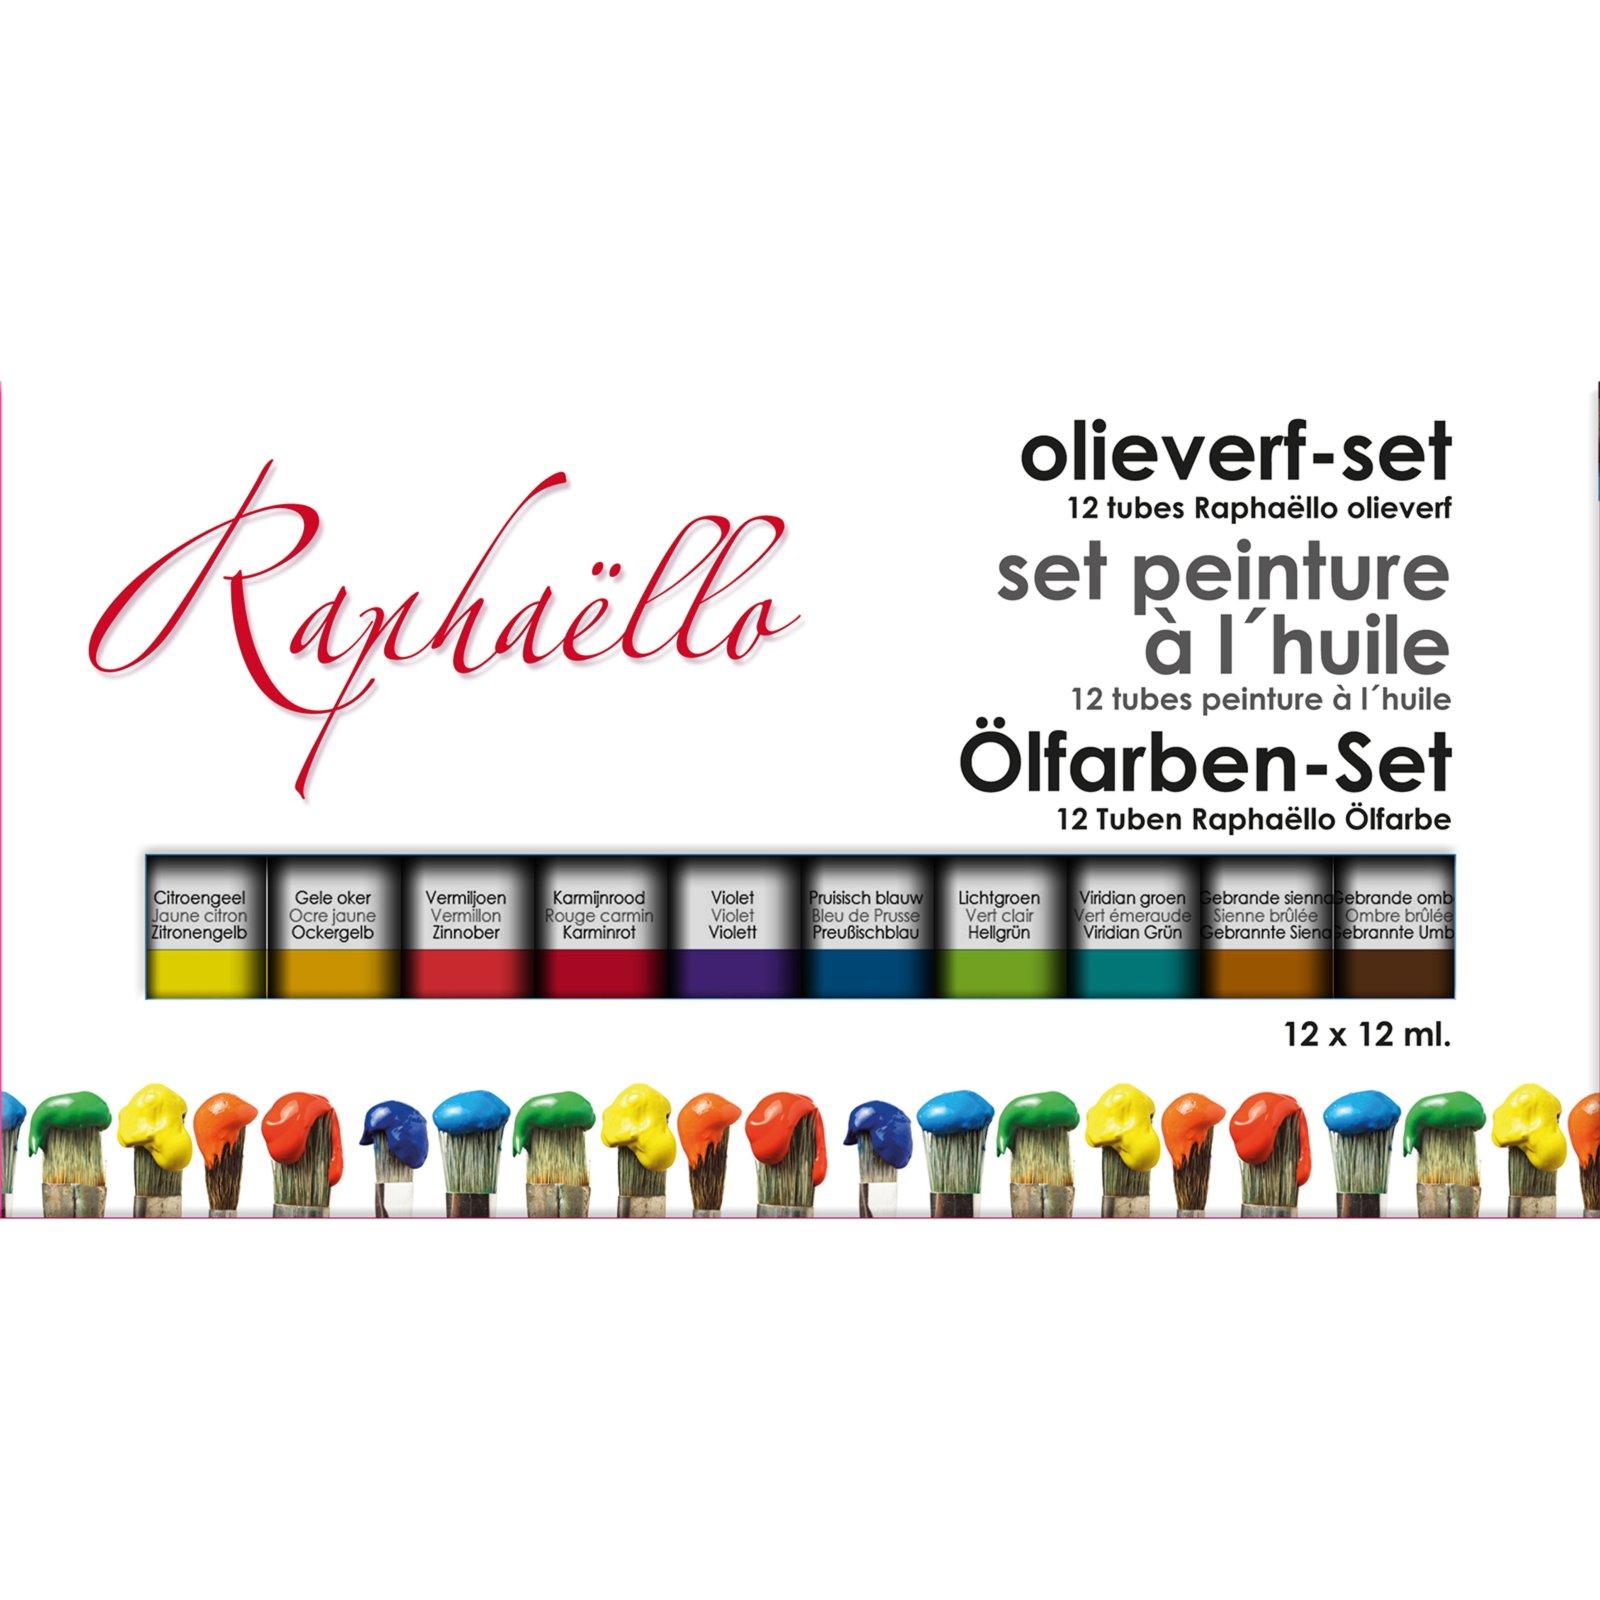 12-teiliges Ölfarben-Set - 12 x 12 g